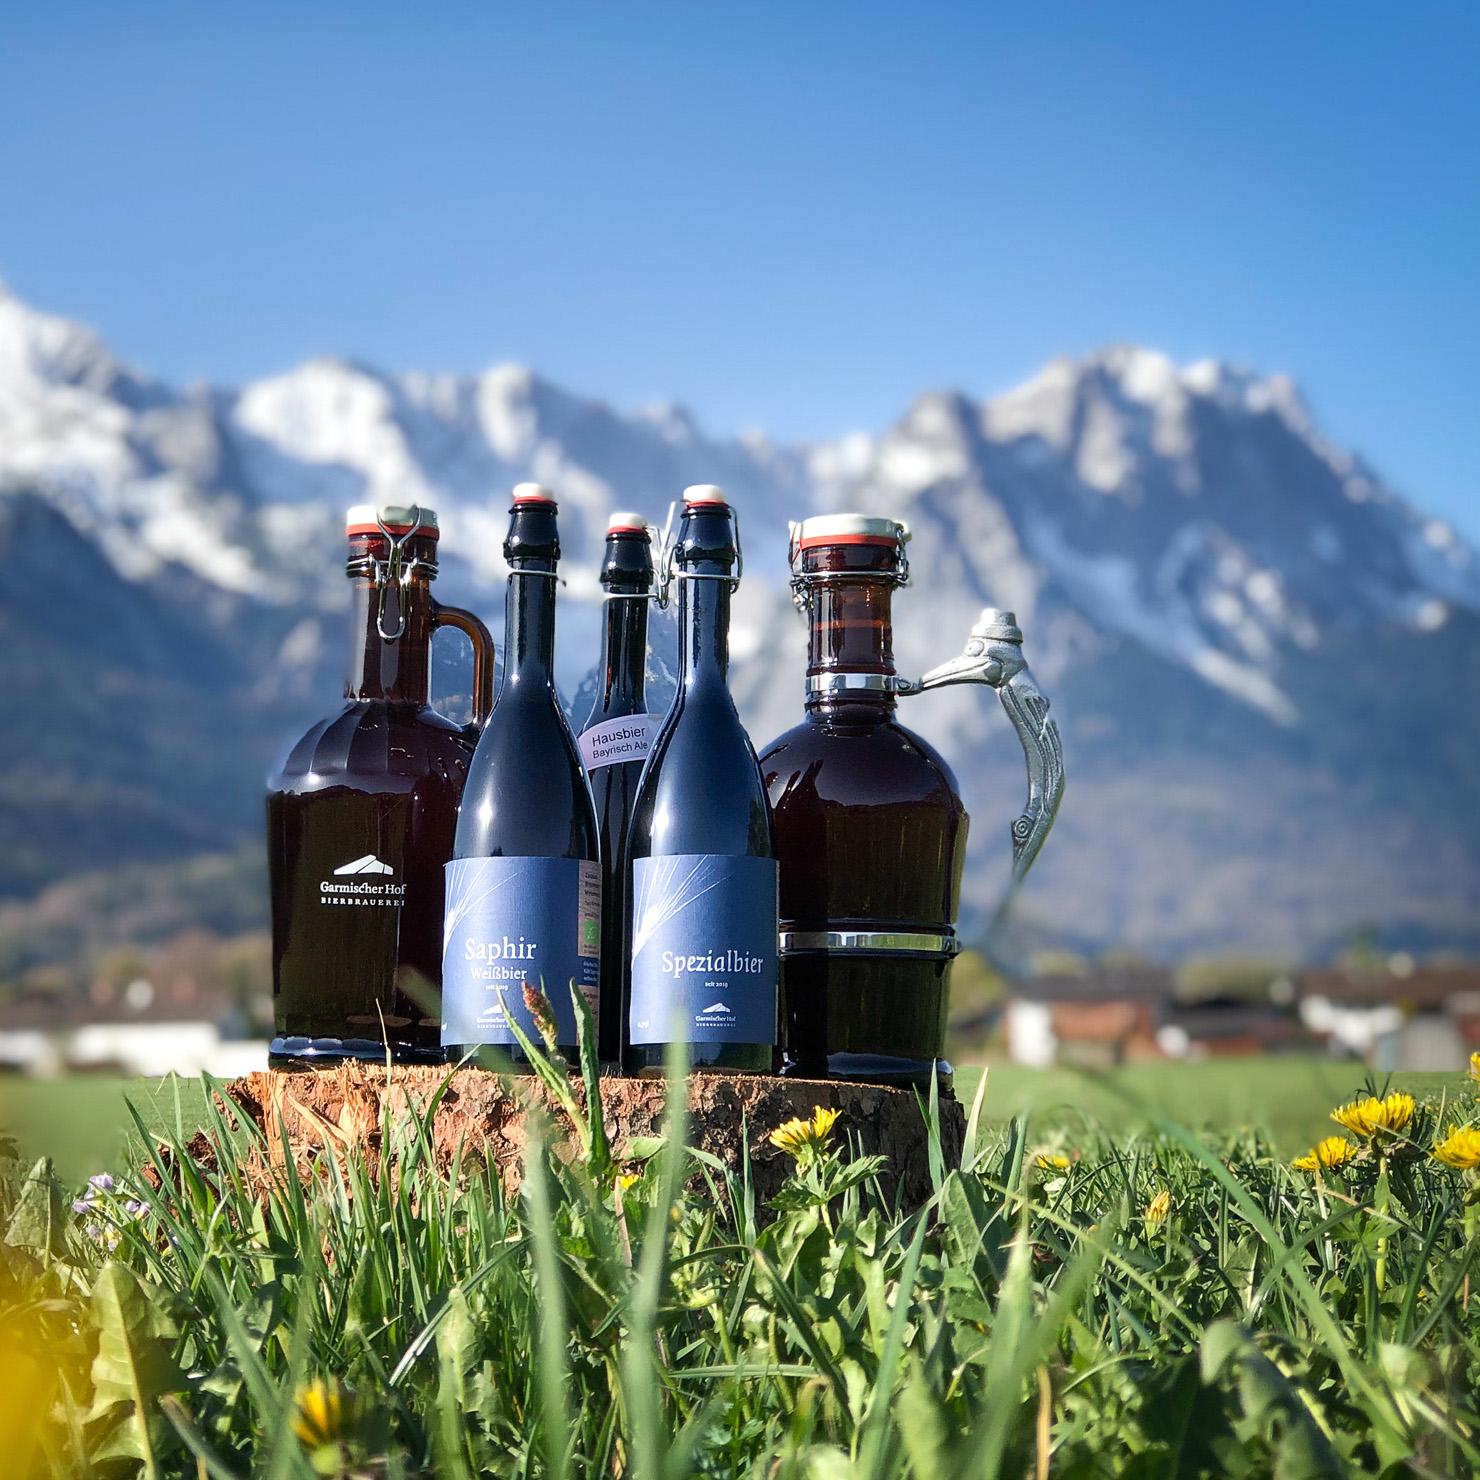 Garmischer Hof Bierbrauerei Getränkekarte Biersortiment